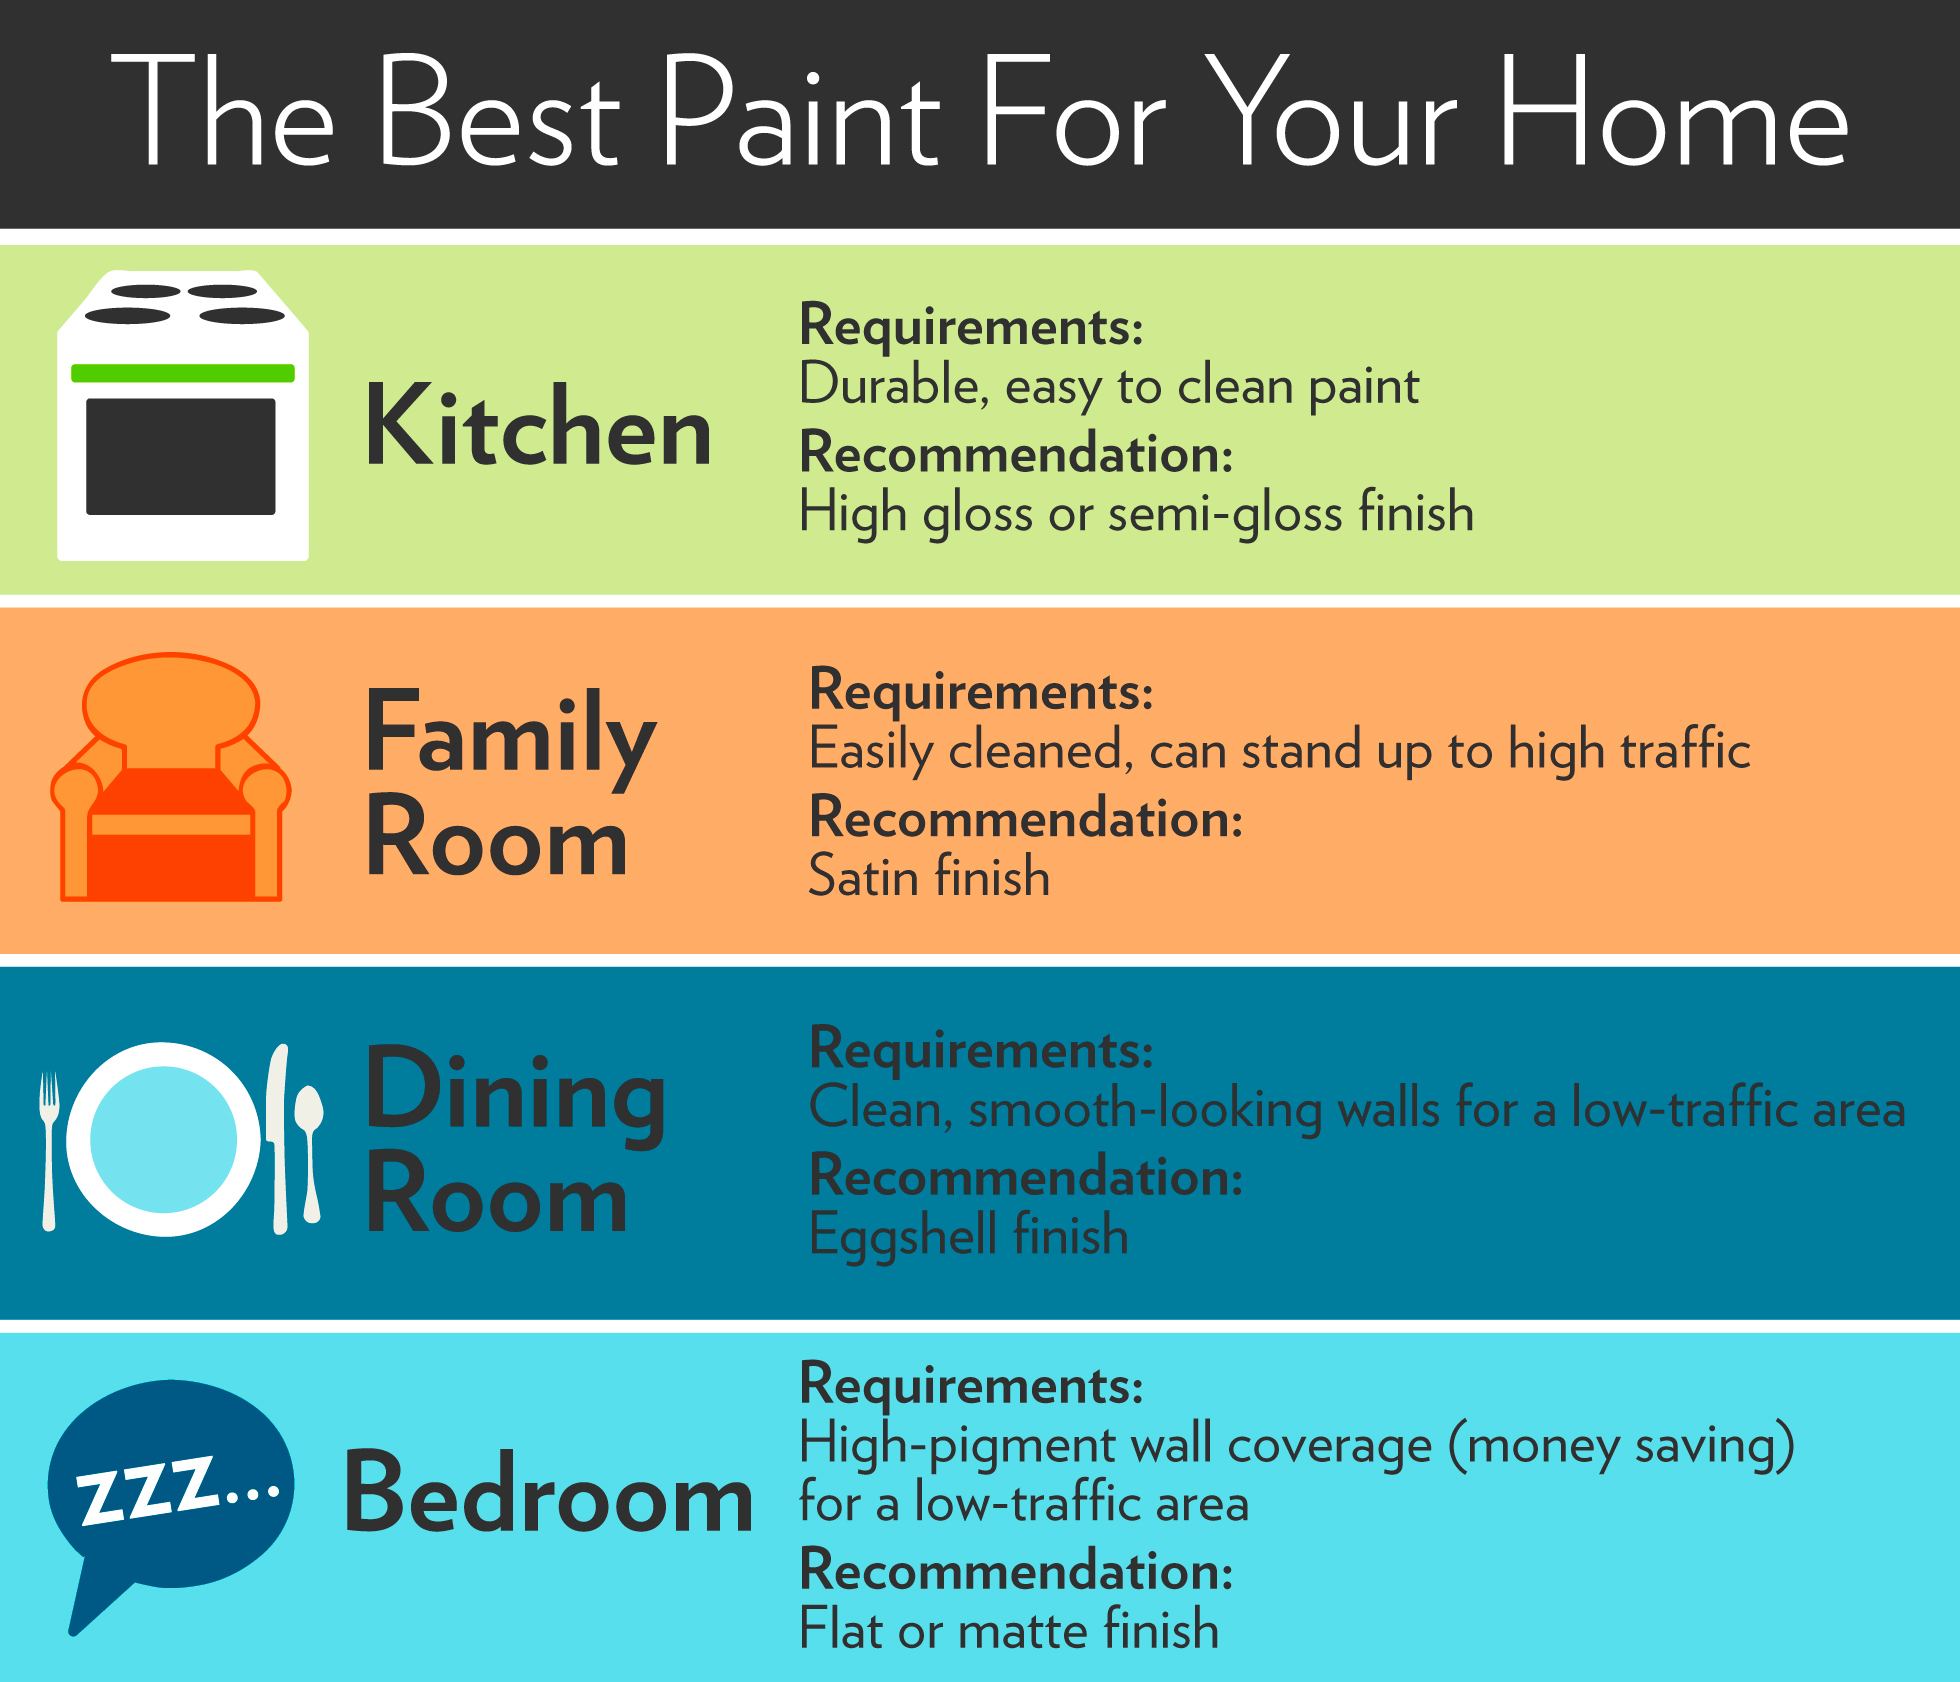 paint-sheen-infographic-retina_retina_3b359c3e9904b470a7bd63f60142697e.jpg